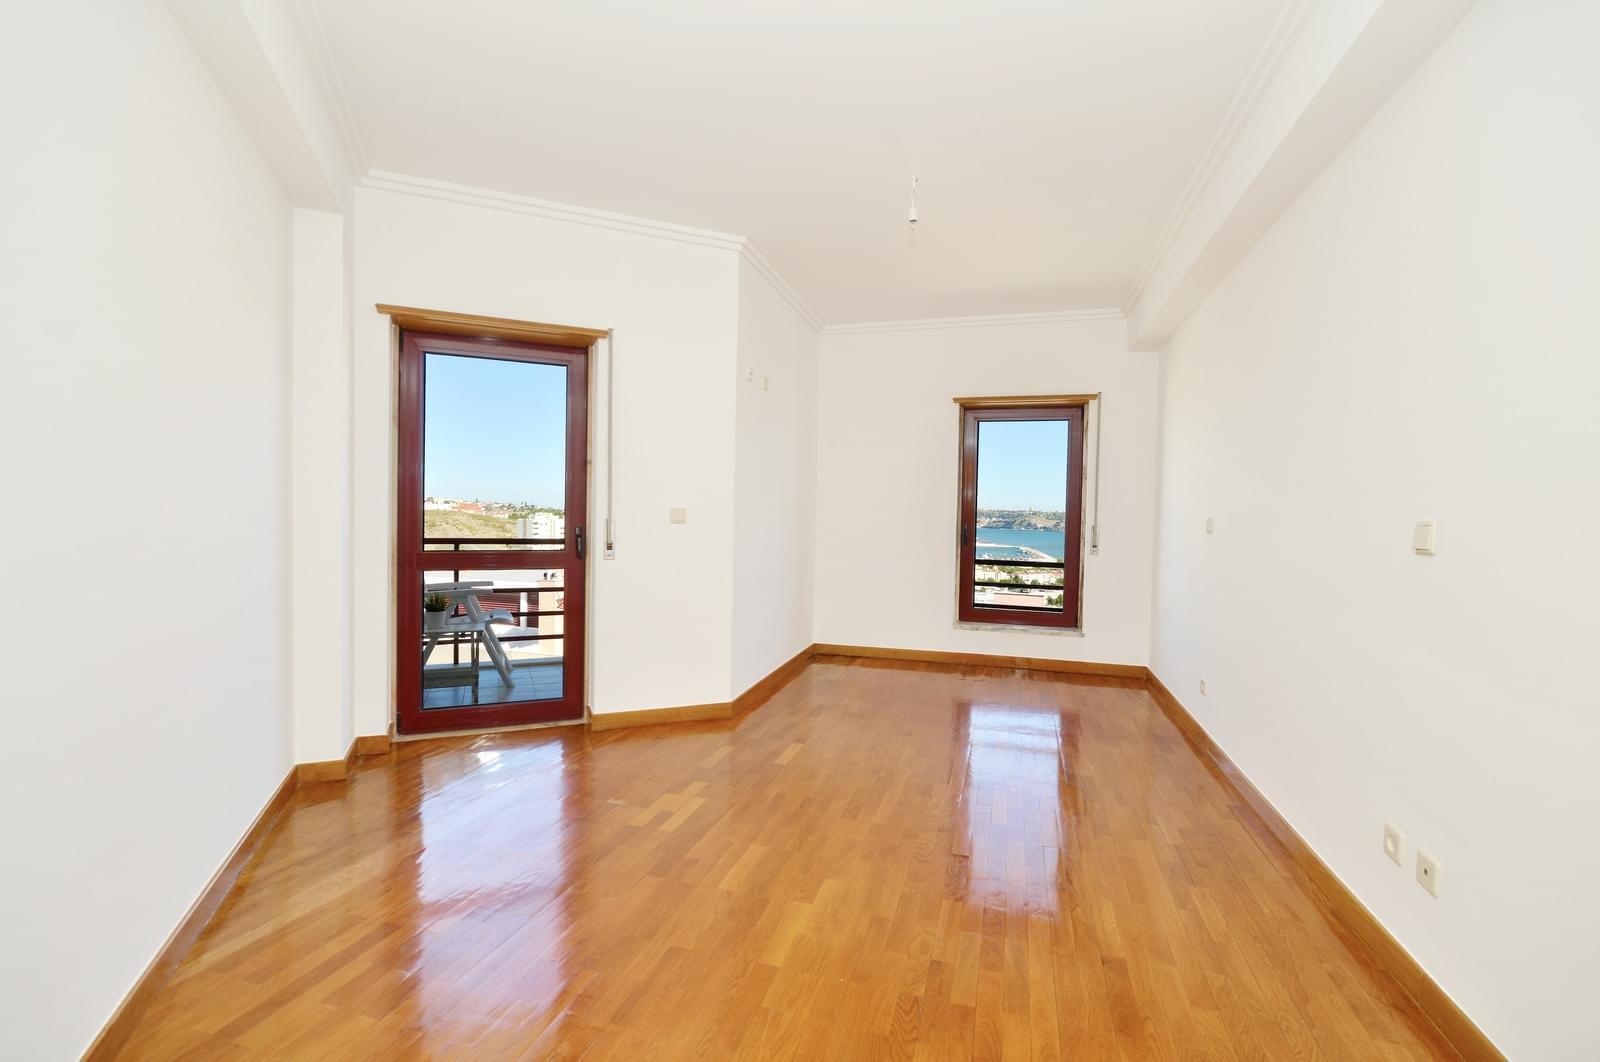 pf17174-apartamento-t3-oeiras-4edbdf5d-97cc-415c-9ffb-32c061bb2e93